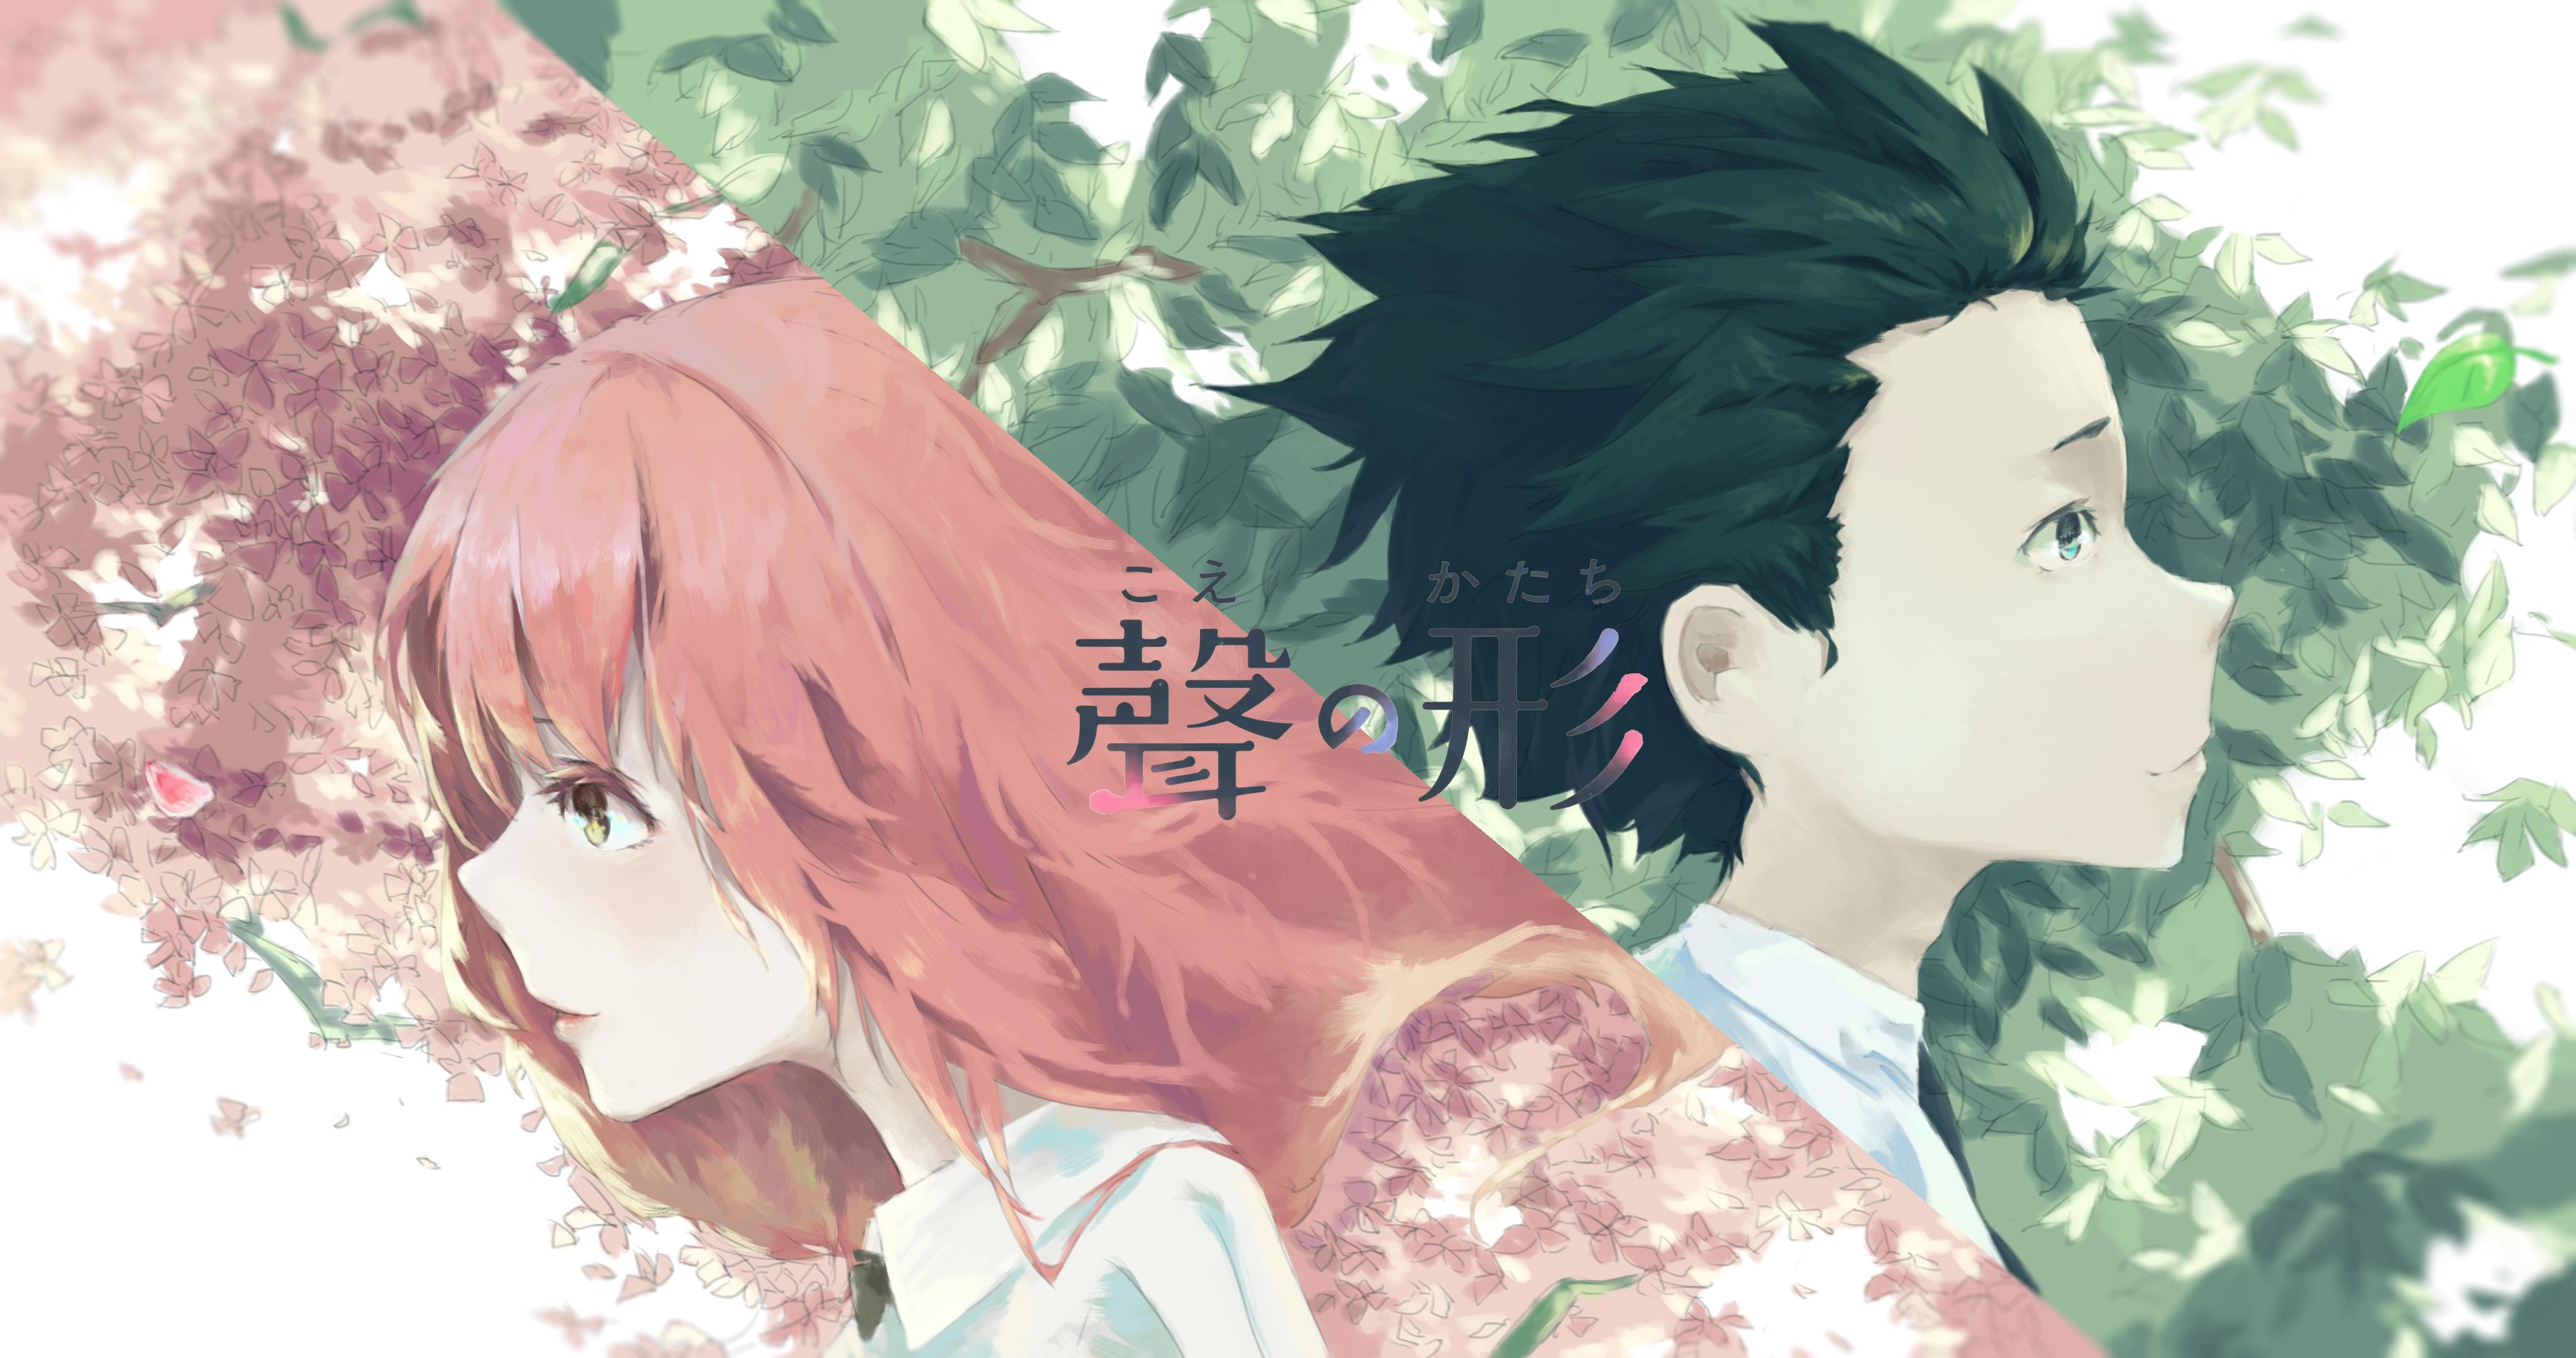 Hd wallpaper koe no katachi - Koe No Katachi Wallpapers Pictures Images